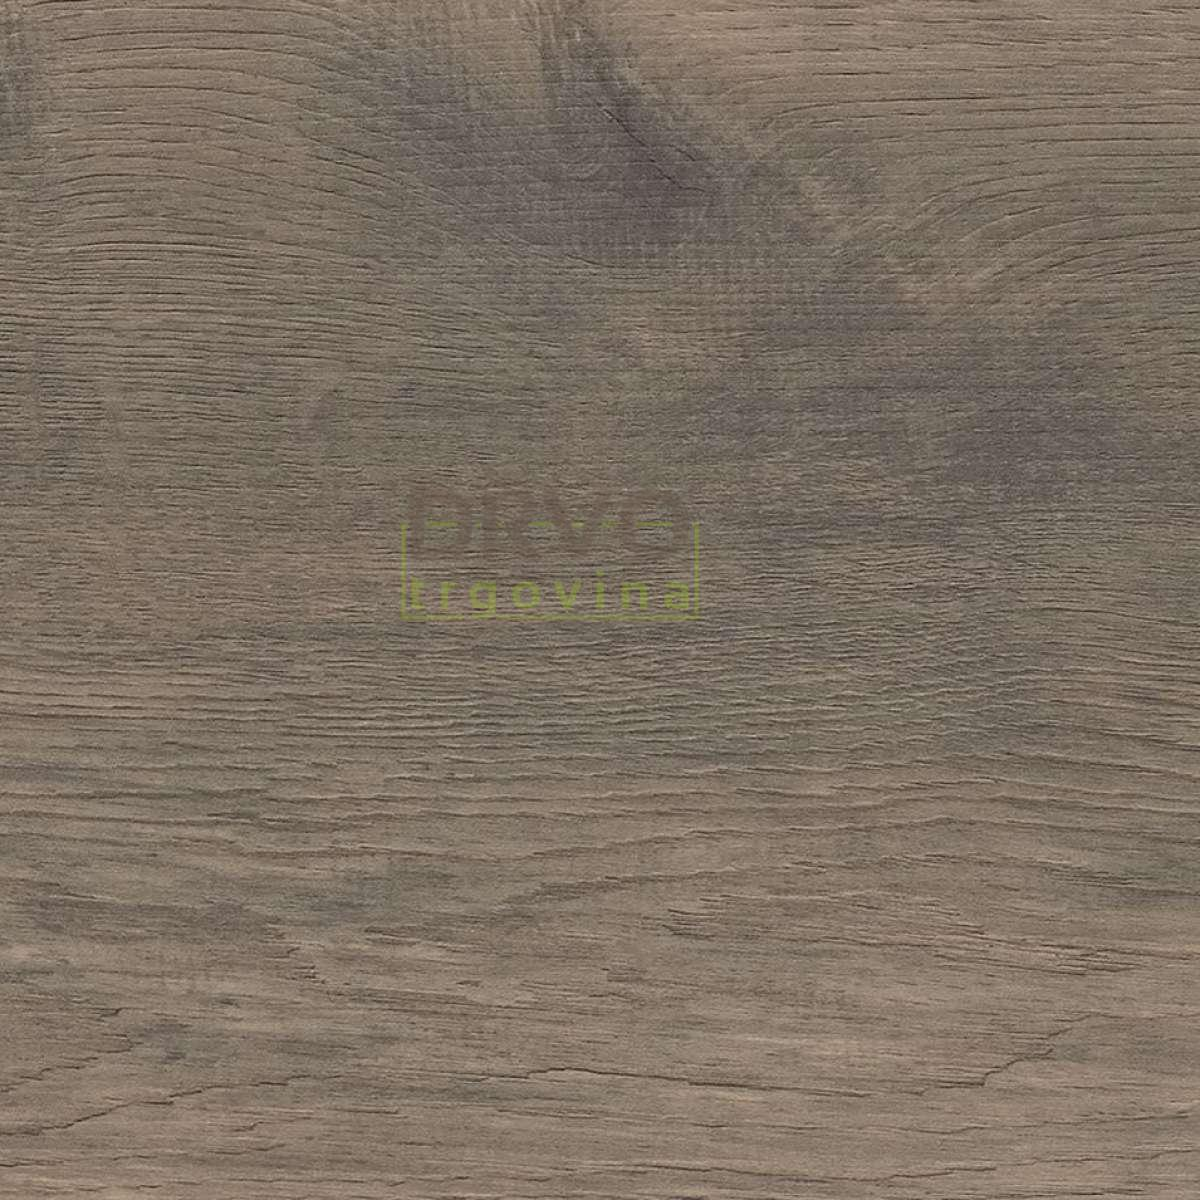 LAMINAT  8mm/Kl.32 HARO TRITTY100 538 767 HRAST BERGAMO CARBON GREY GRAN VIA p=2,68m2